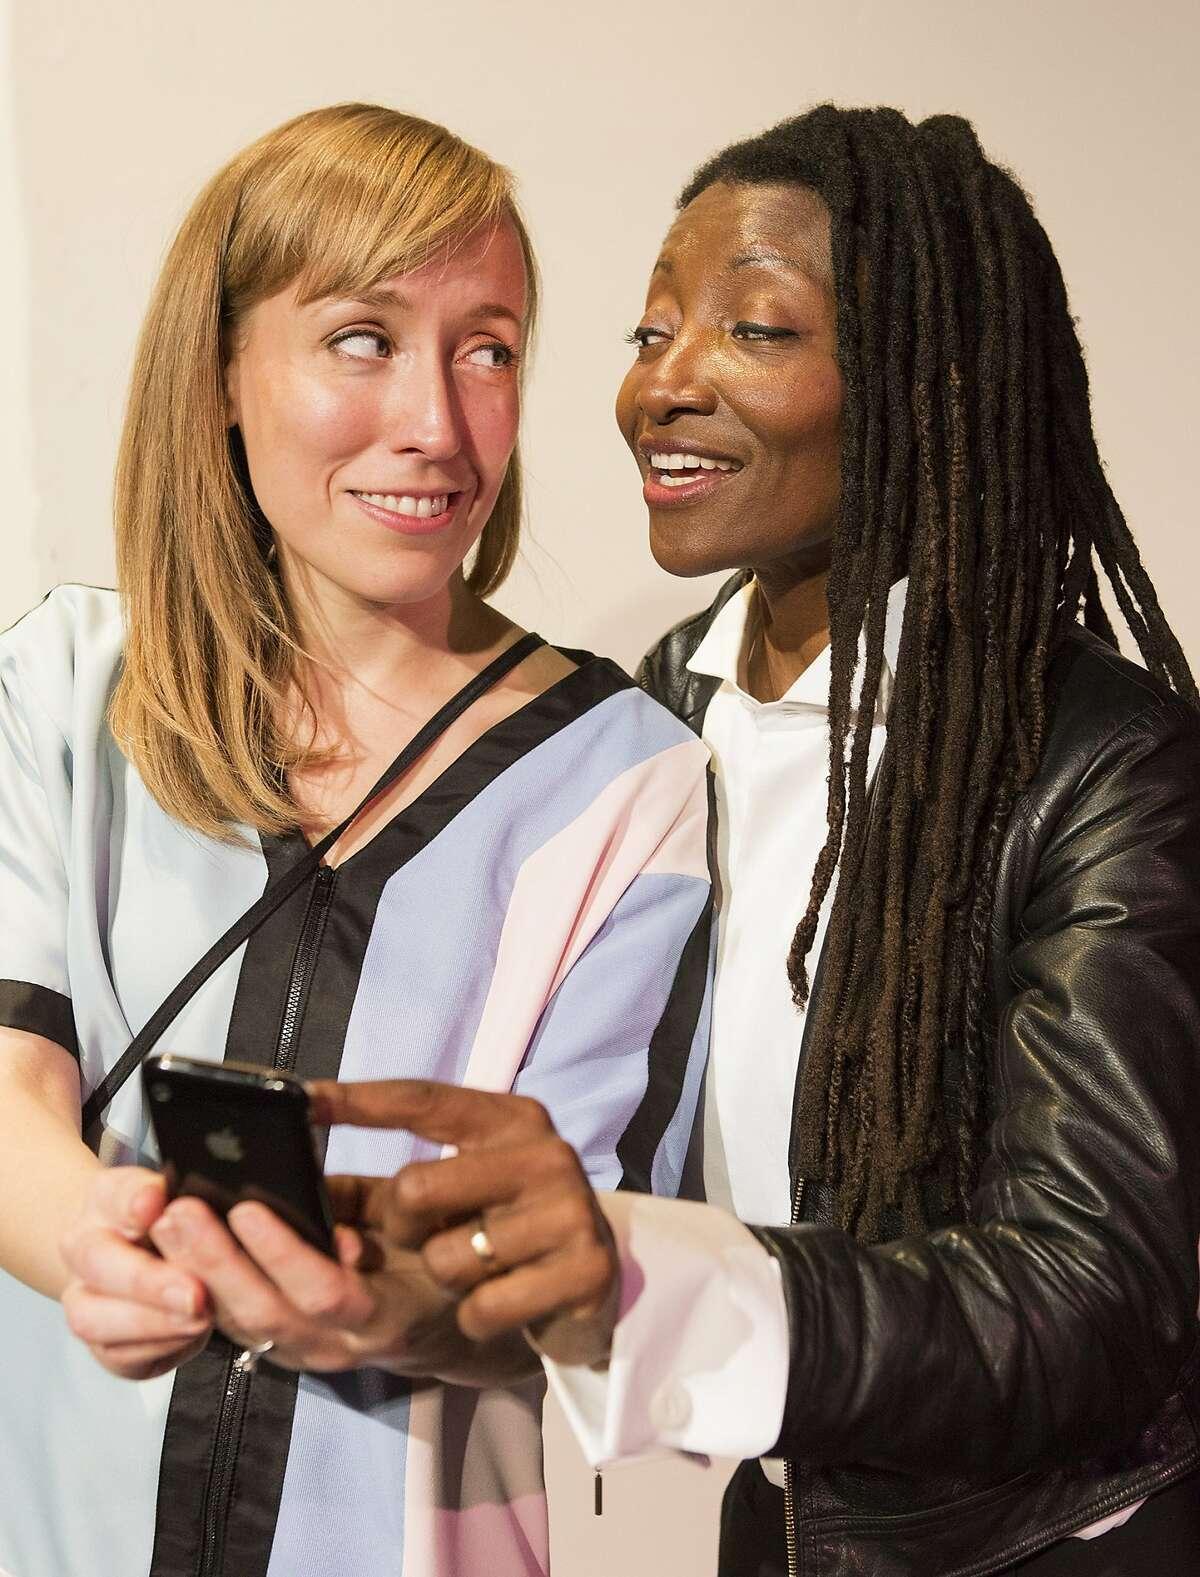 Melissa Keith, left, as Annie and Nkechi Emeruwa as Rebecca in